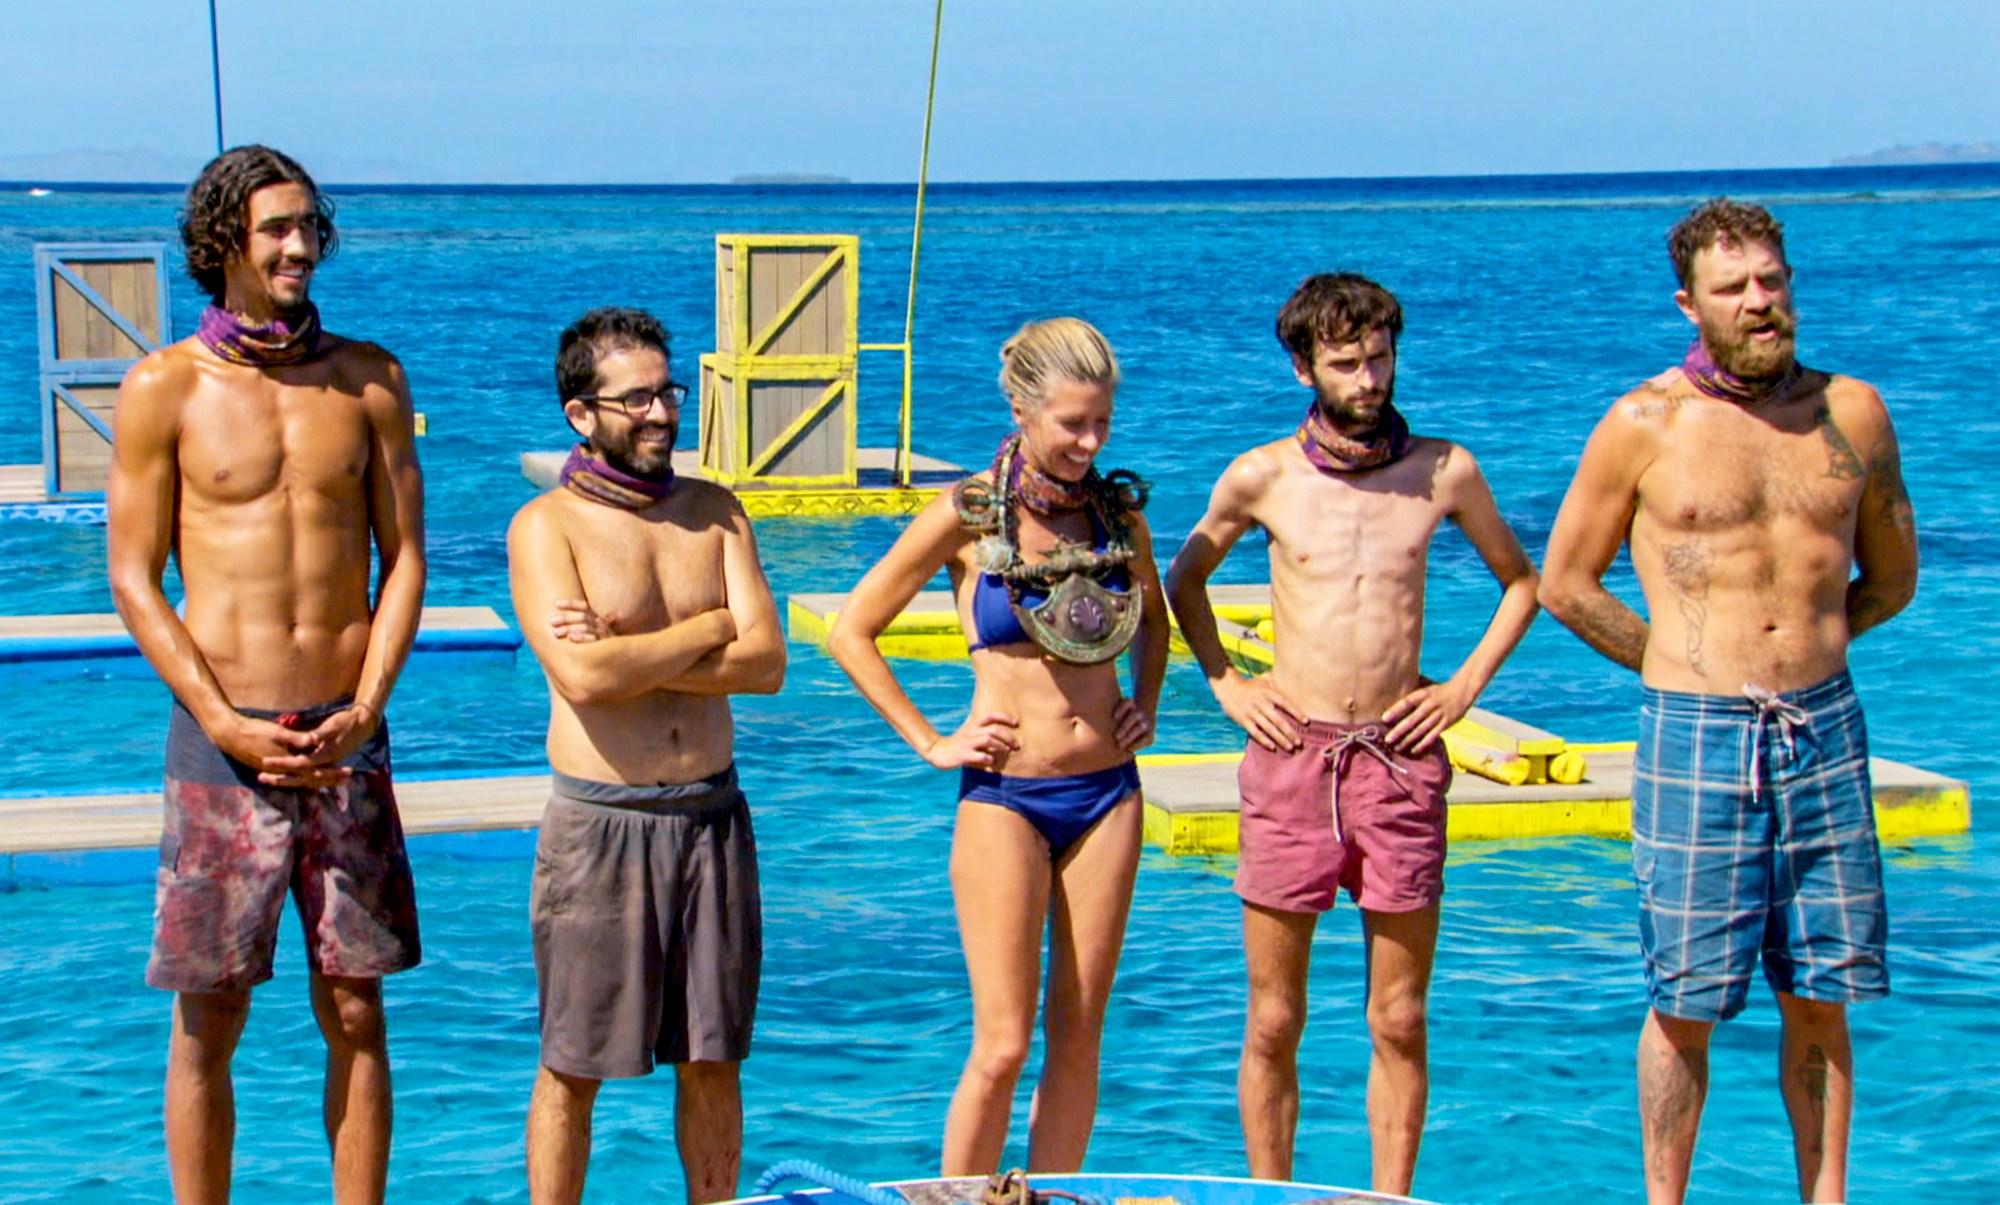 Devon Pinto, Mike Zahalsky, Chrissy Hofbeck, Ryan Ulrich and Ben Driebergen on the finale of Survivor 35, themed 'Heroes vs. Healers vs. Hustlers'